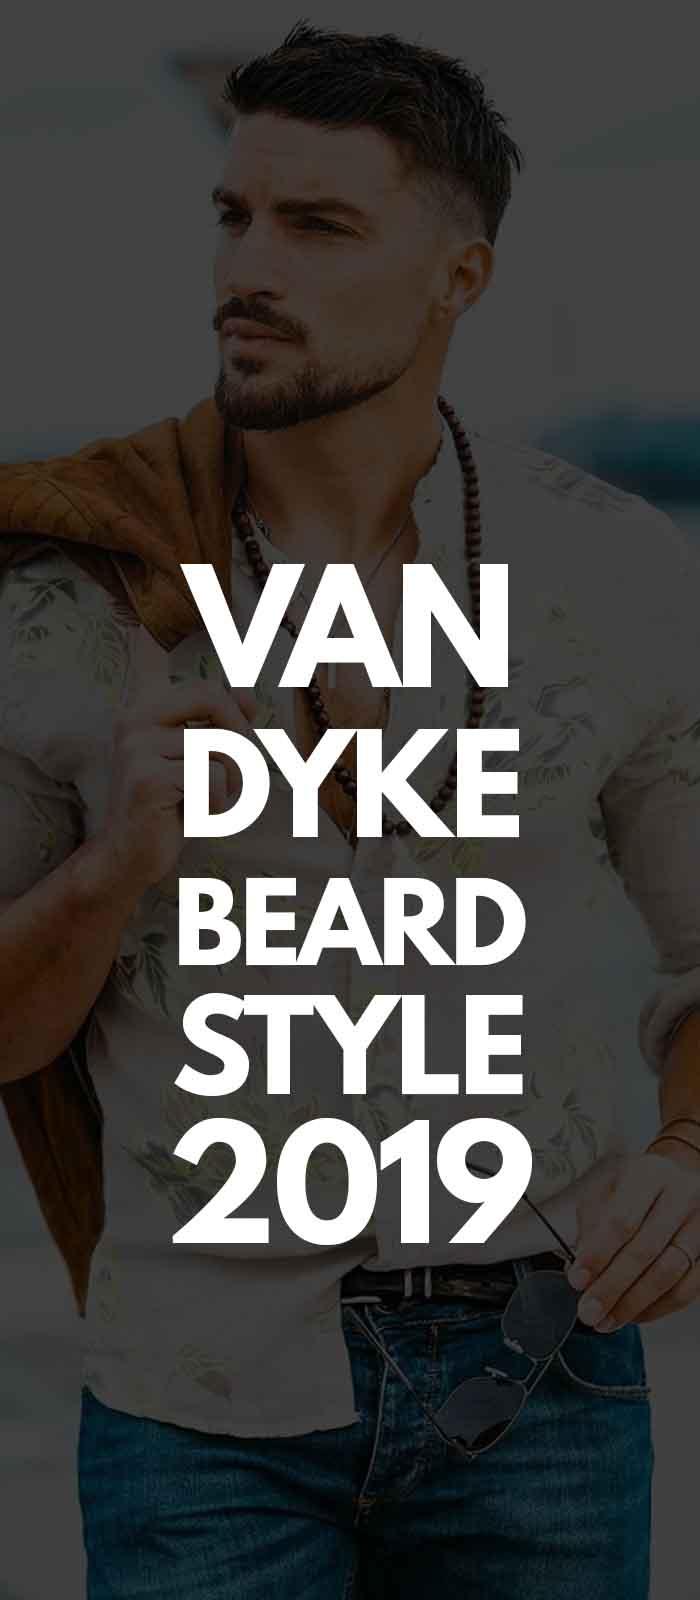 Printed Shirt,Van Dyke beard and sunglasses!